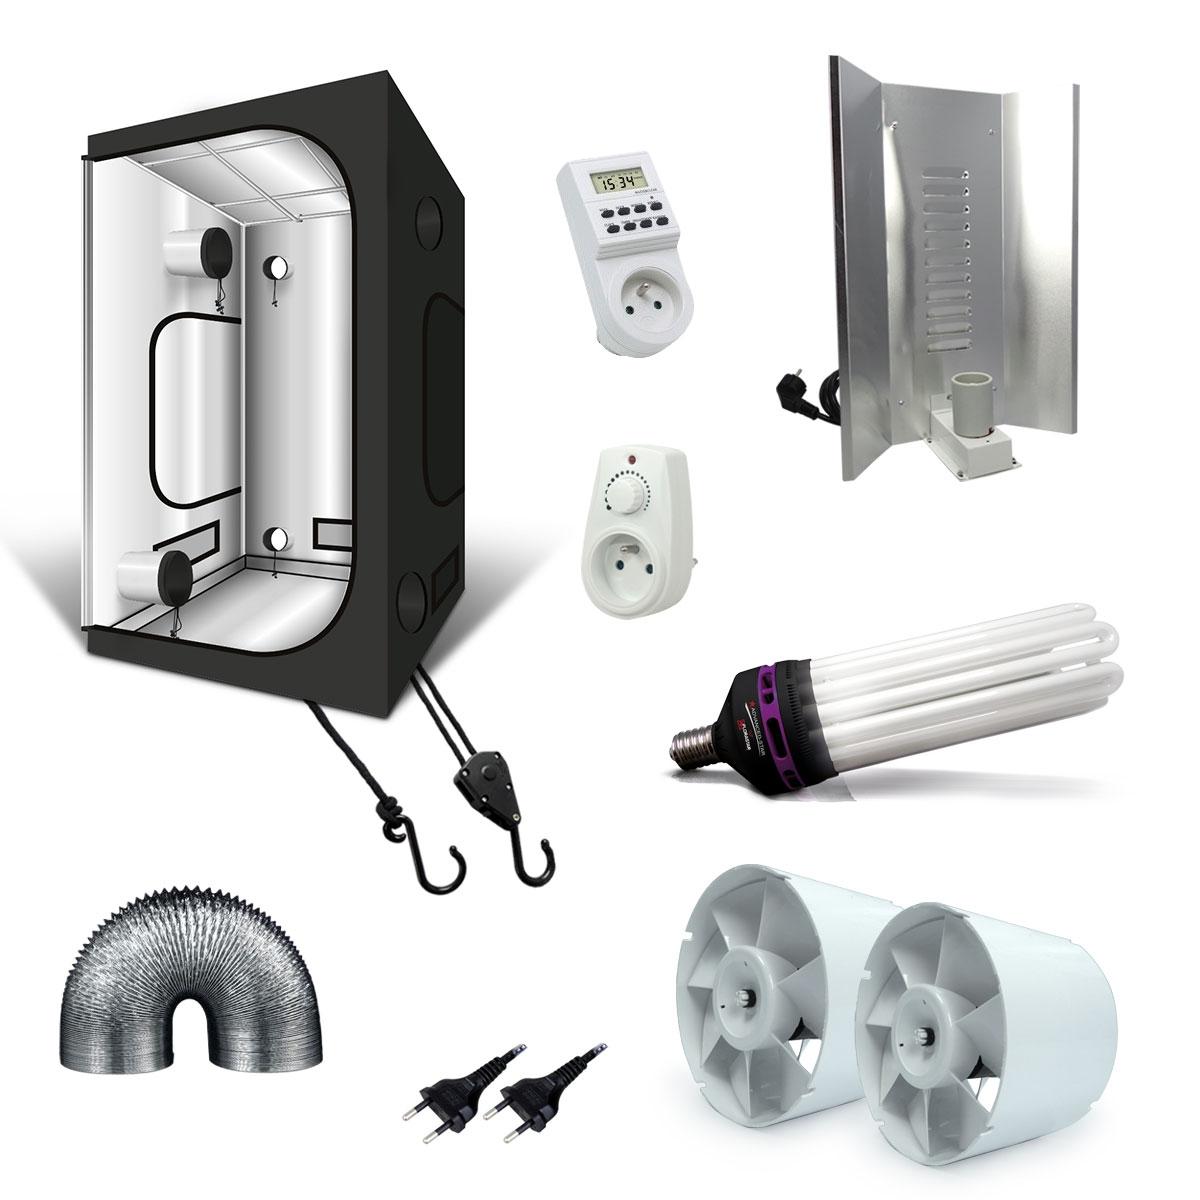 pack box g max 120x120x200cm lampe co cfl 250w dual spectrum. Black Bedroom Furniture Sets. Home Design Ideas